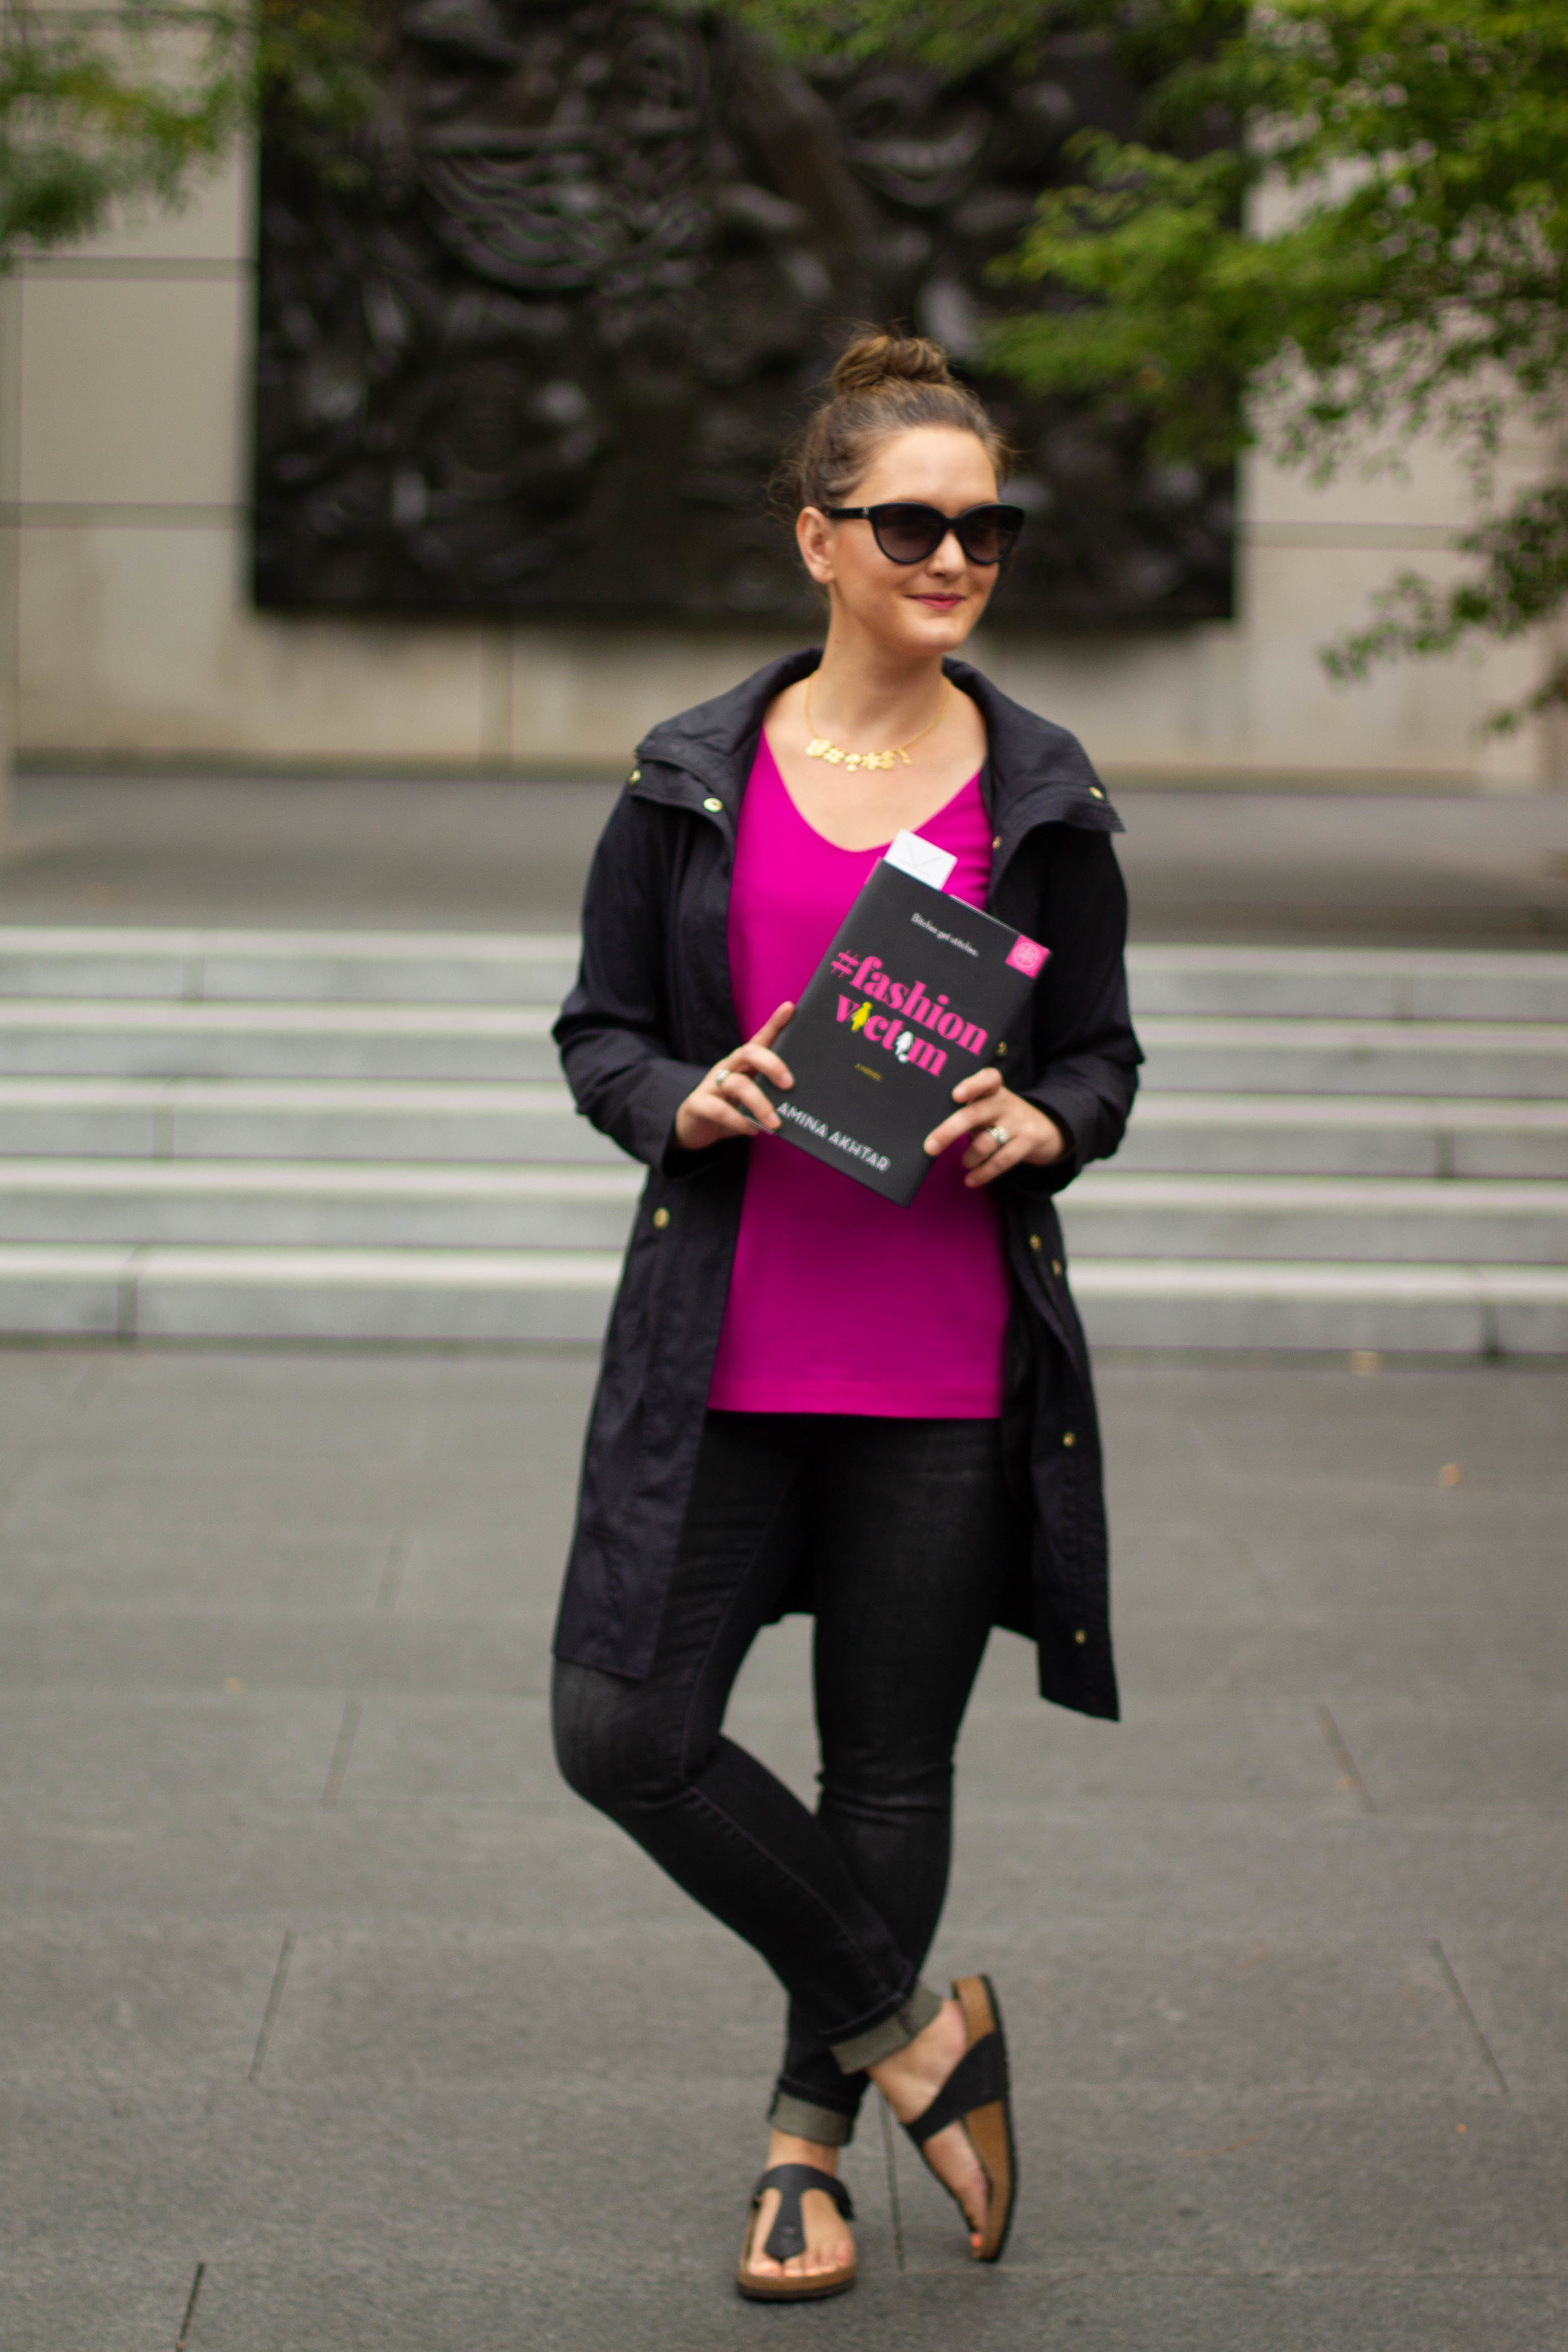 Reading #FashionVictim by Amina Akhtar at City Garden in St. Louis, MO